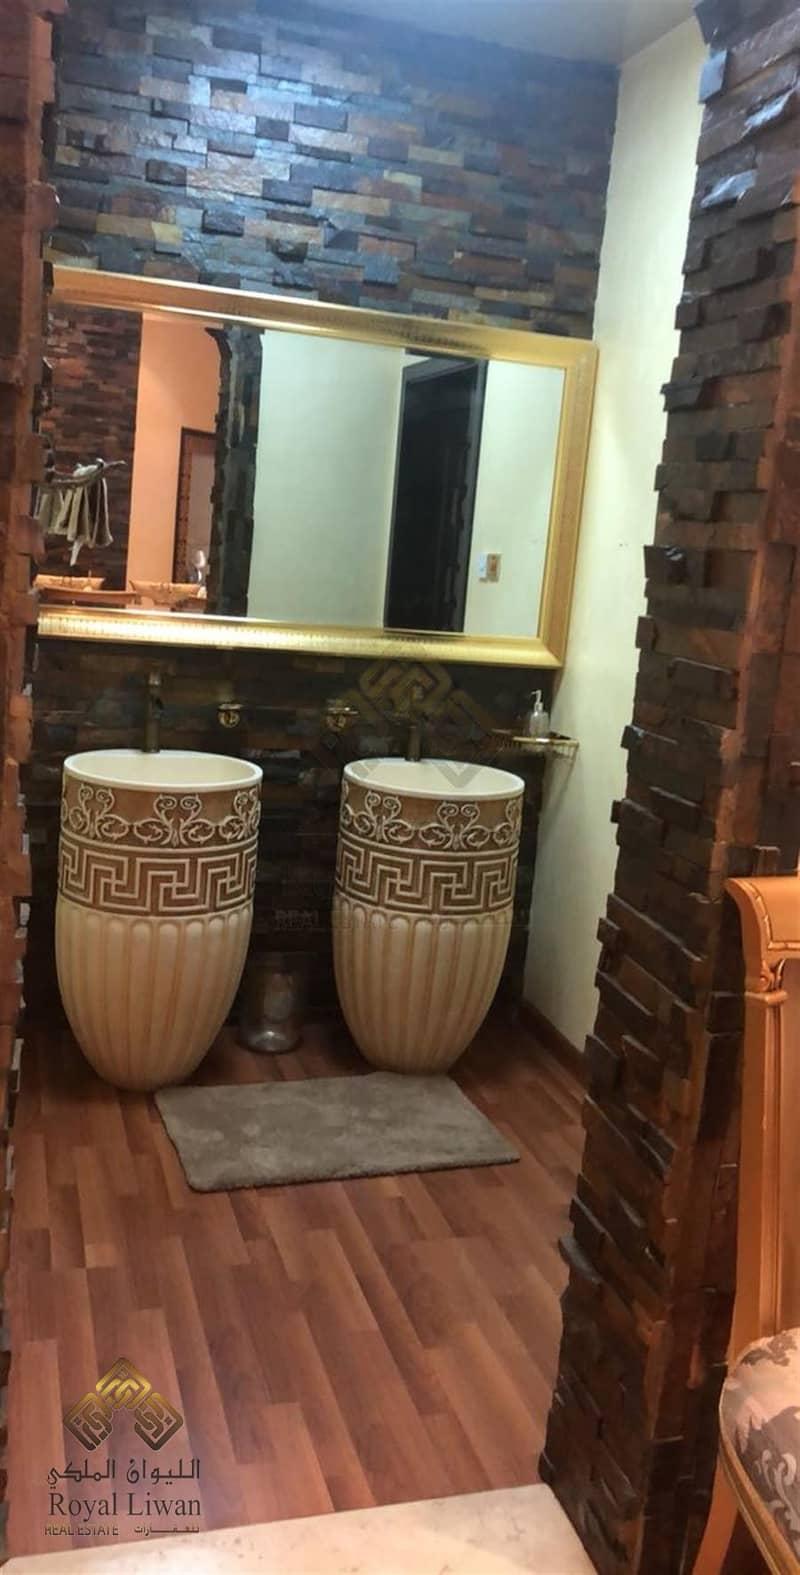 8 6 BEDROOM SUPER DELUXE VILLA FOR SALE IN AL BARSHA 2